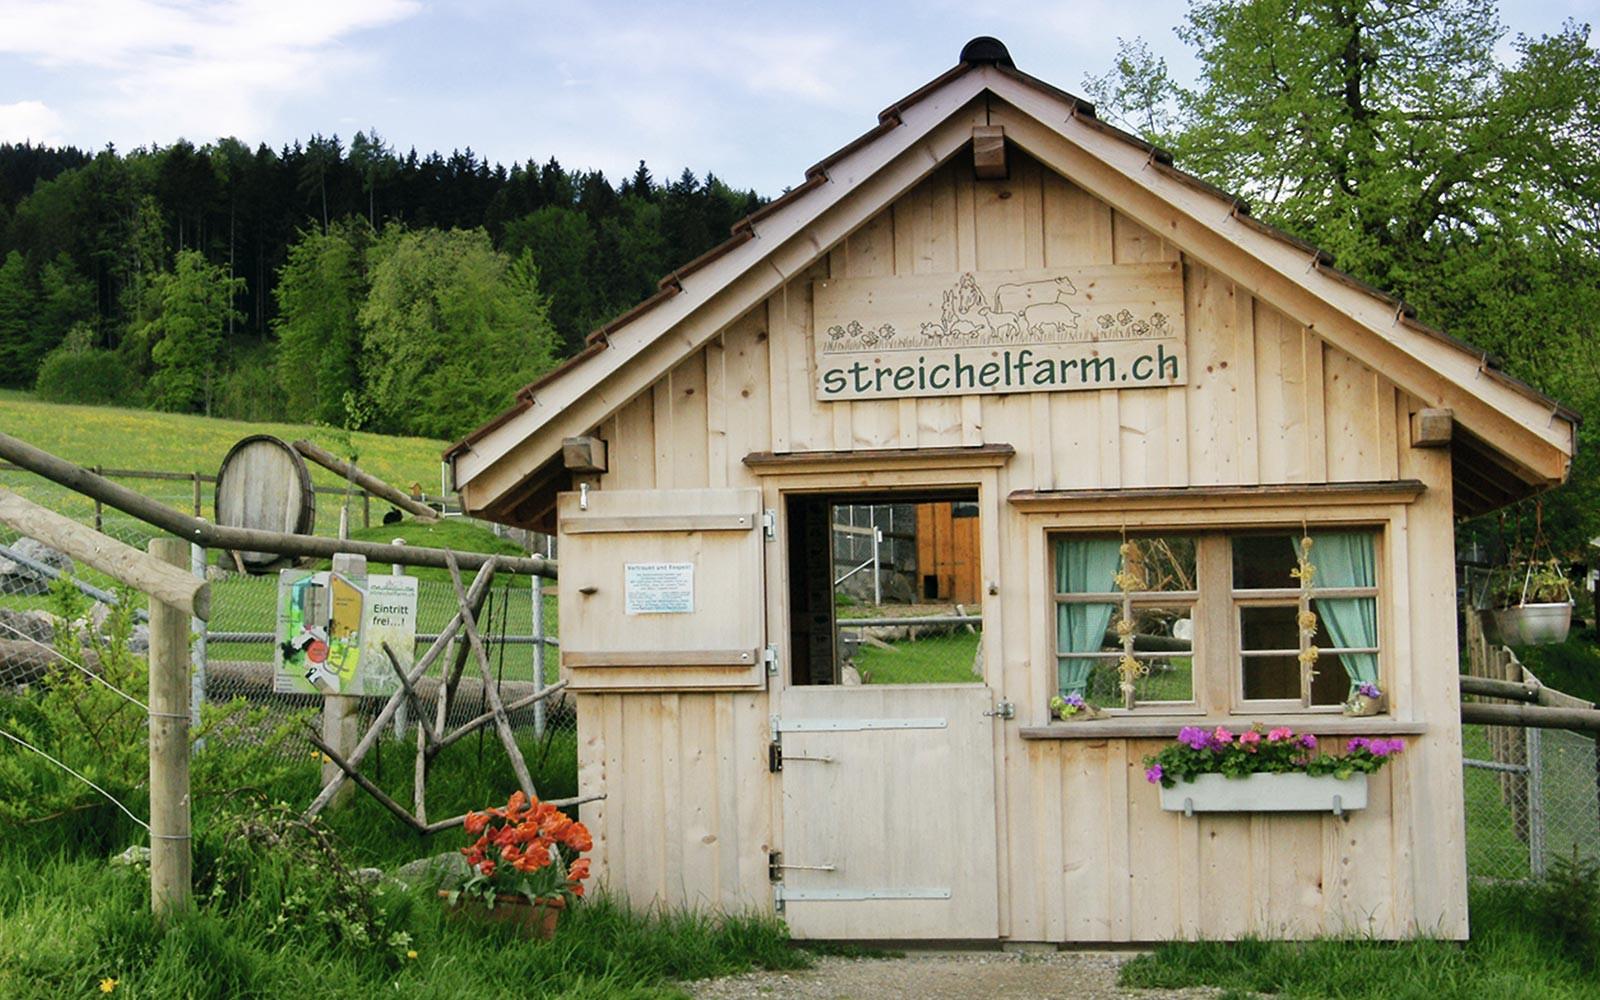 streichelfarm_01.jpg